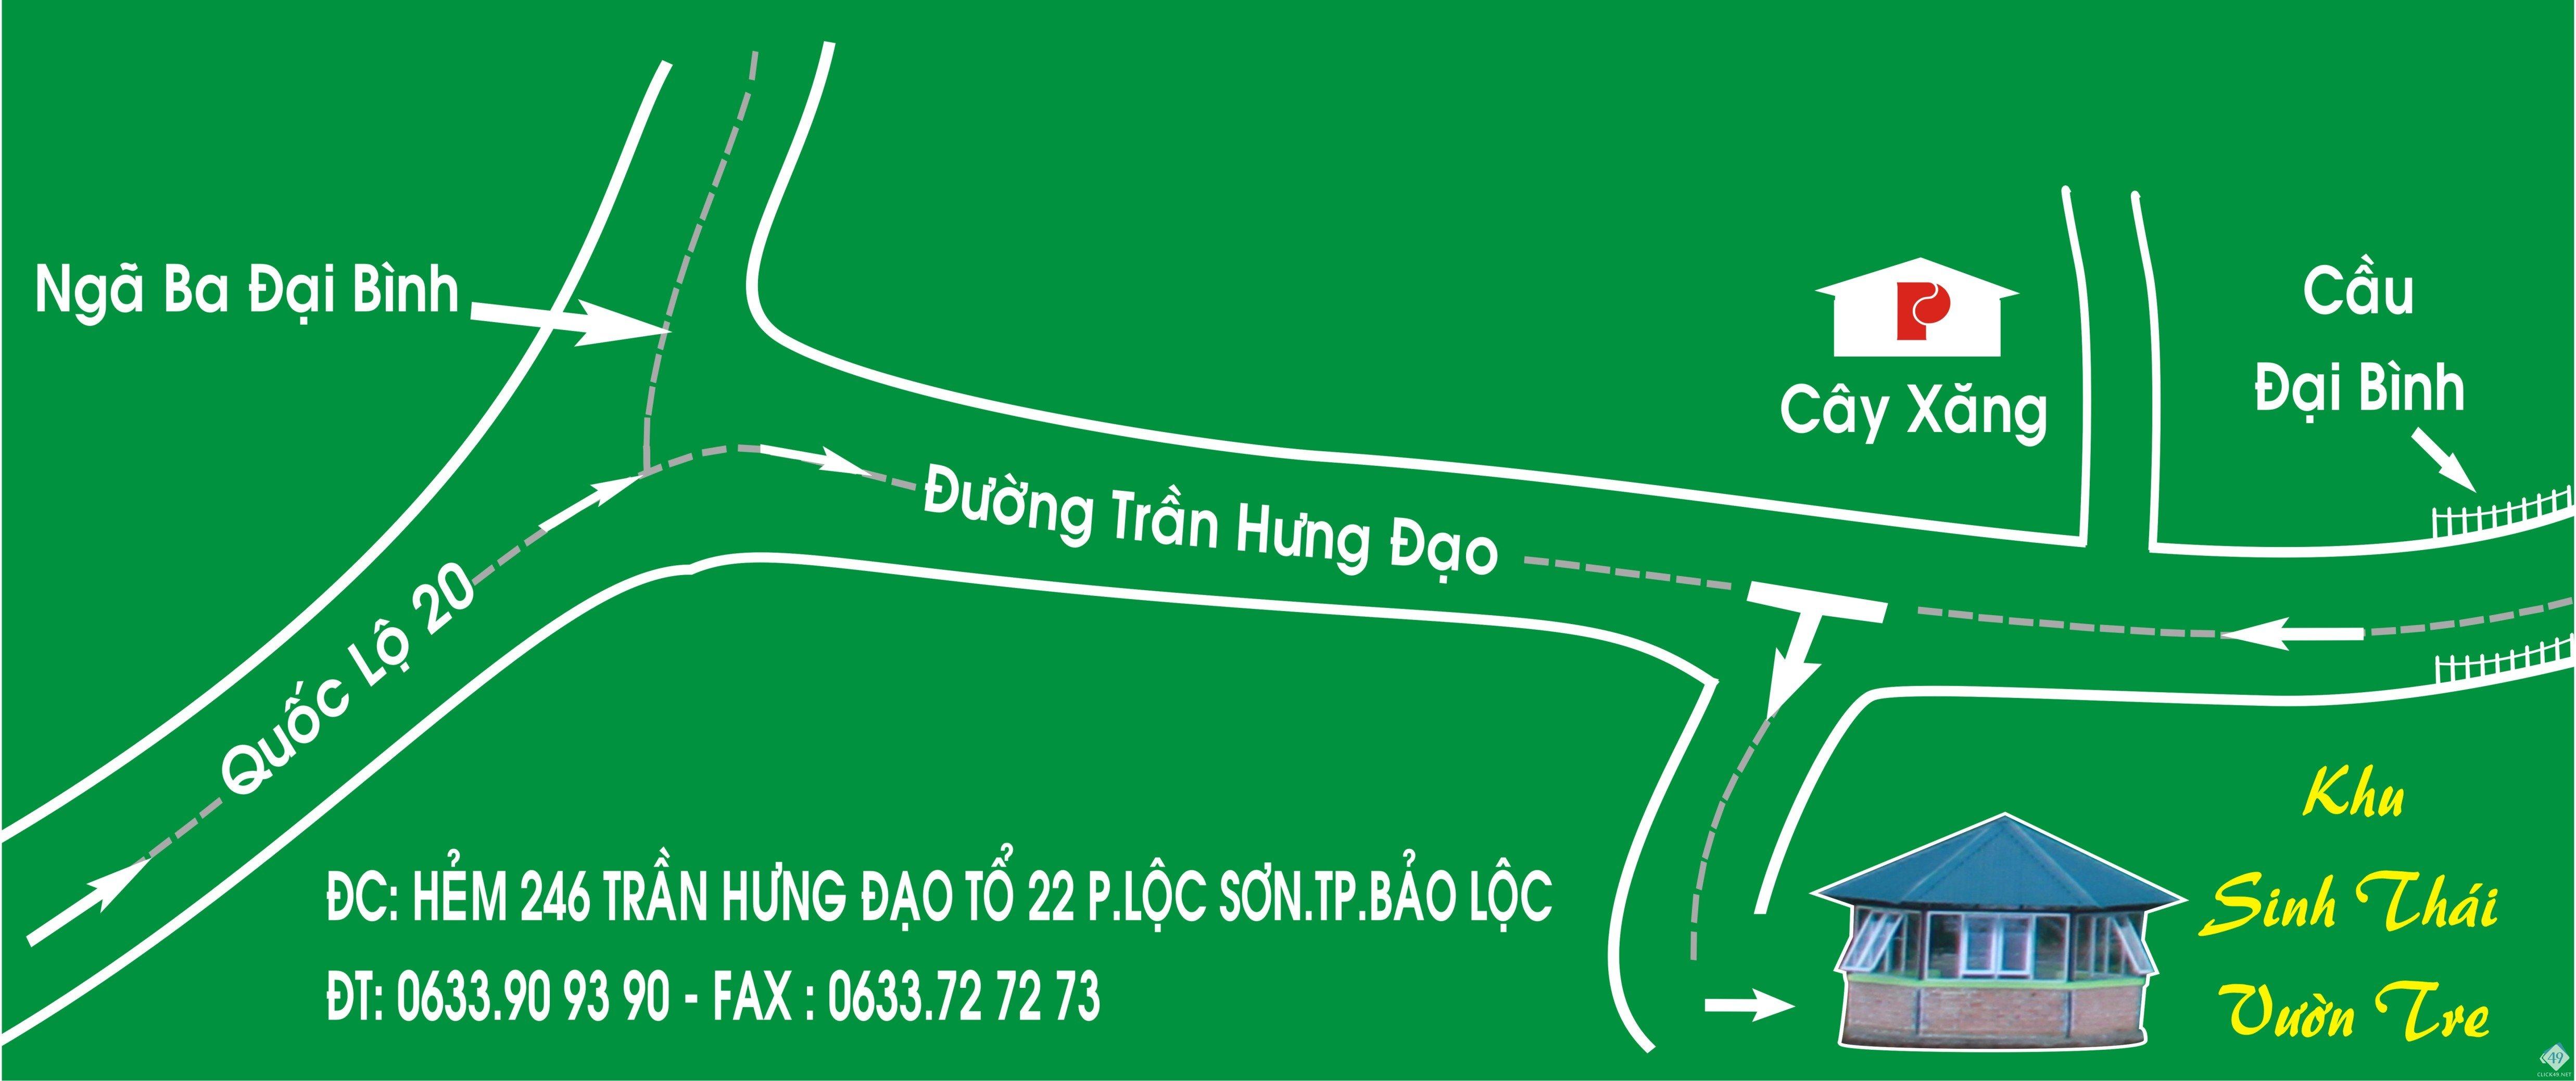 BAN CHI DAN VAO KHU SINH THAI